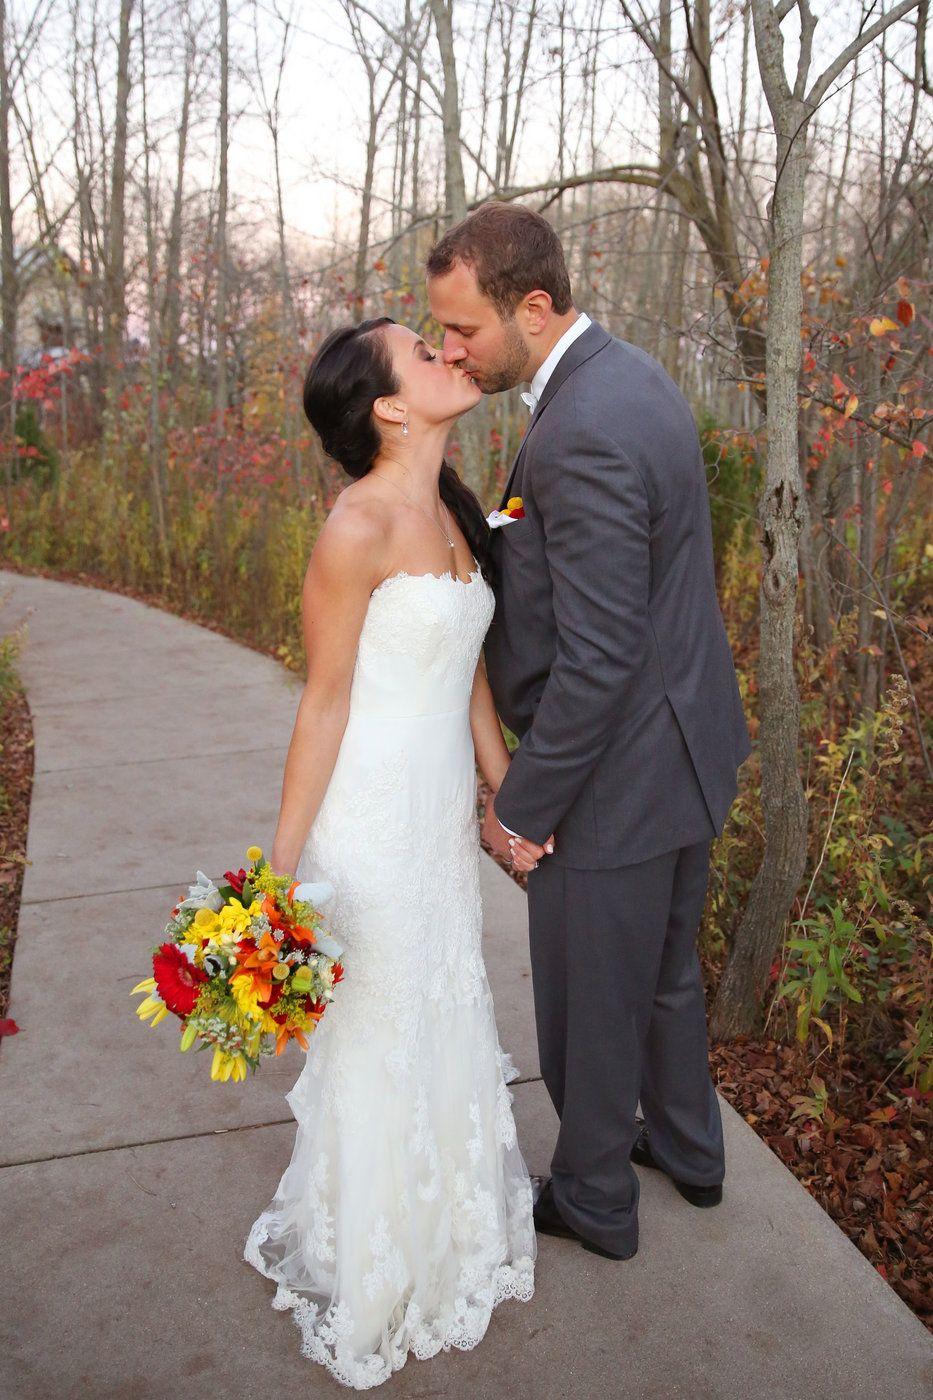 Britt and david photo by lottie lillian photography best wedding